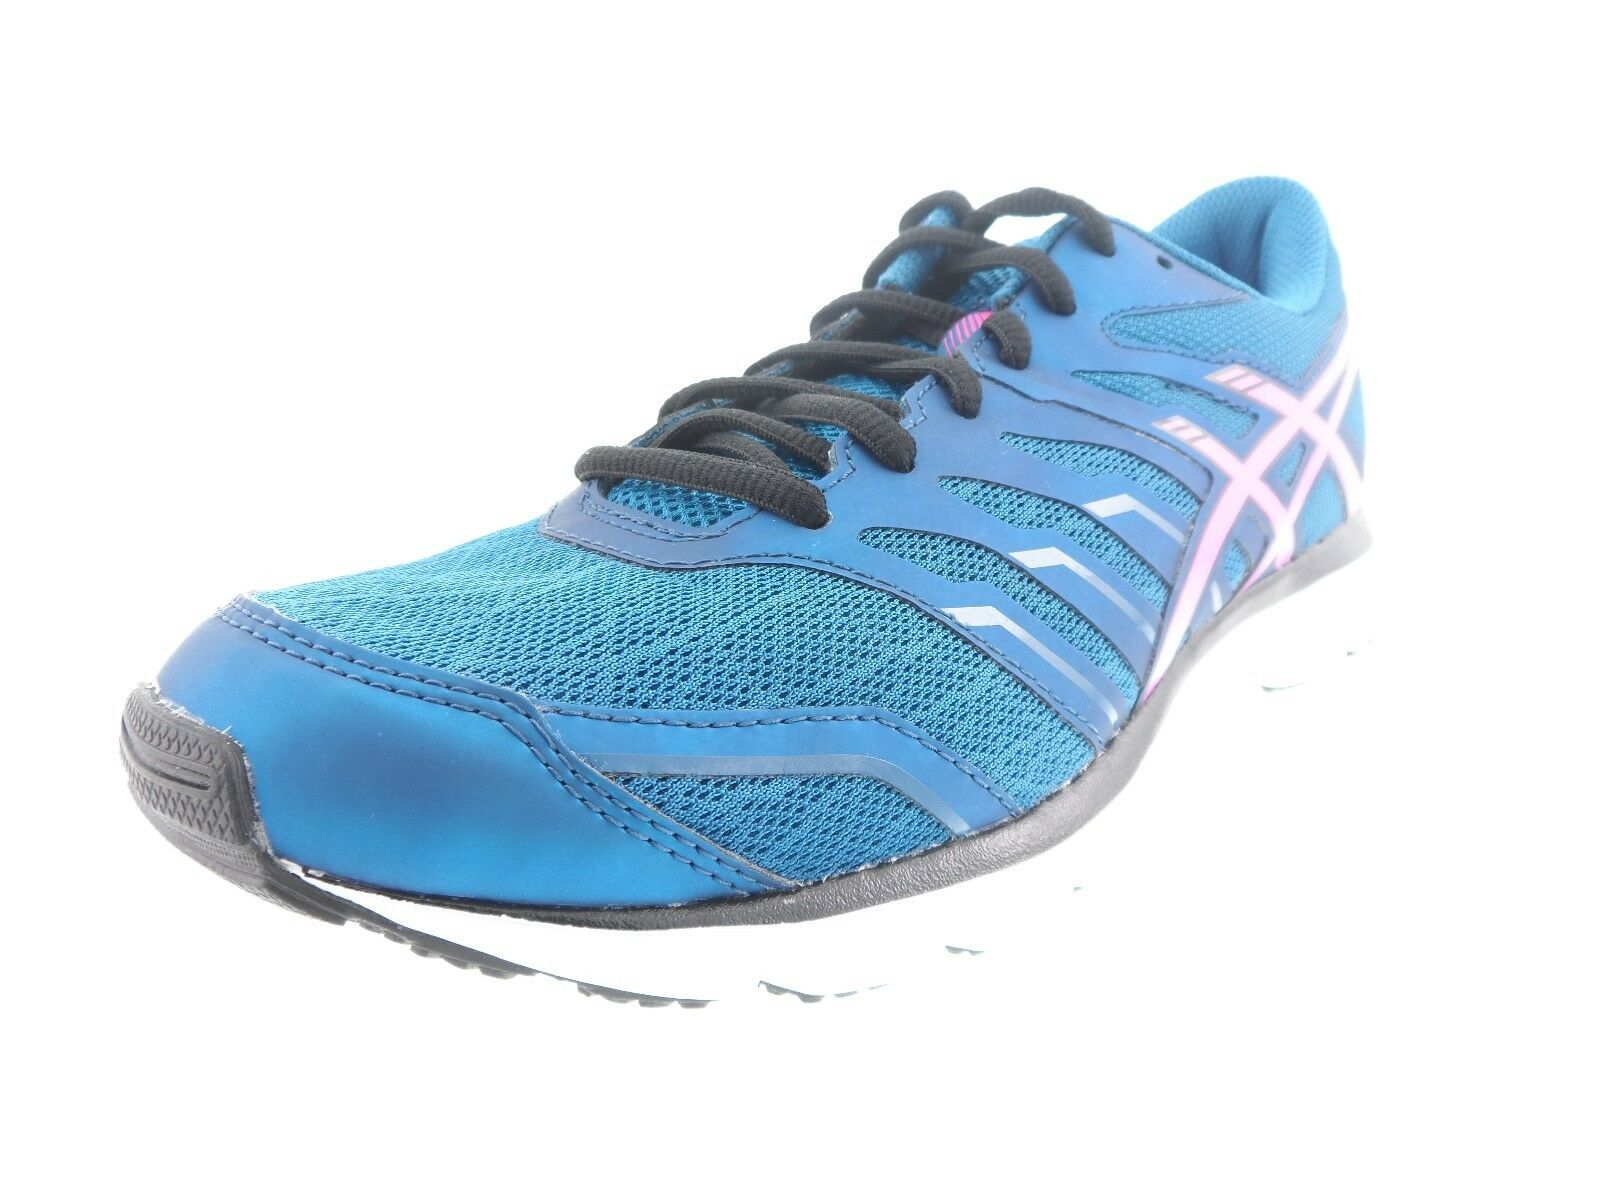 Asics GelZaraca 4 Womens Running shoes, Mosaic bluee‑Purple Size 6.5M